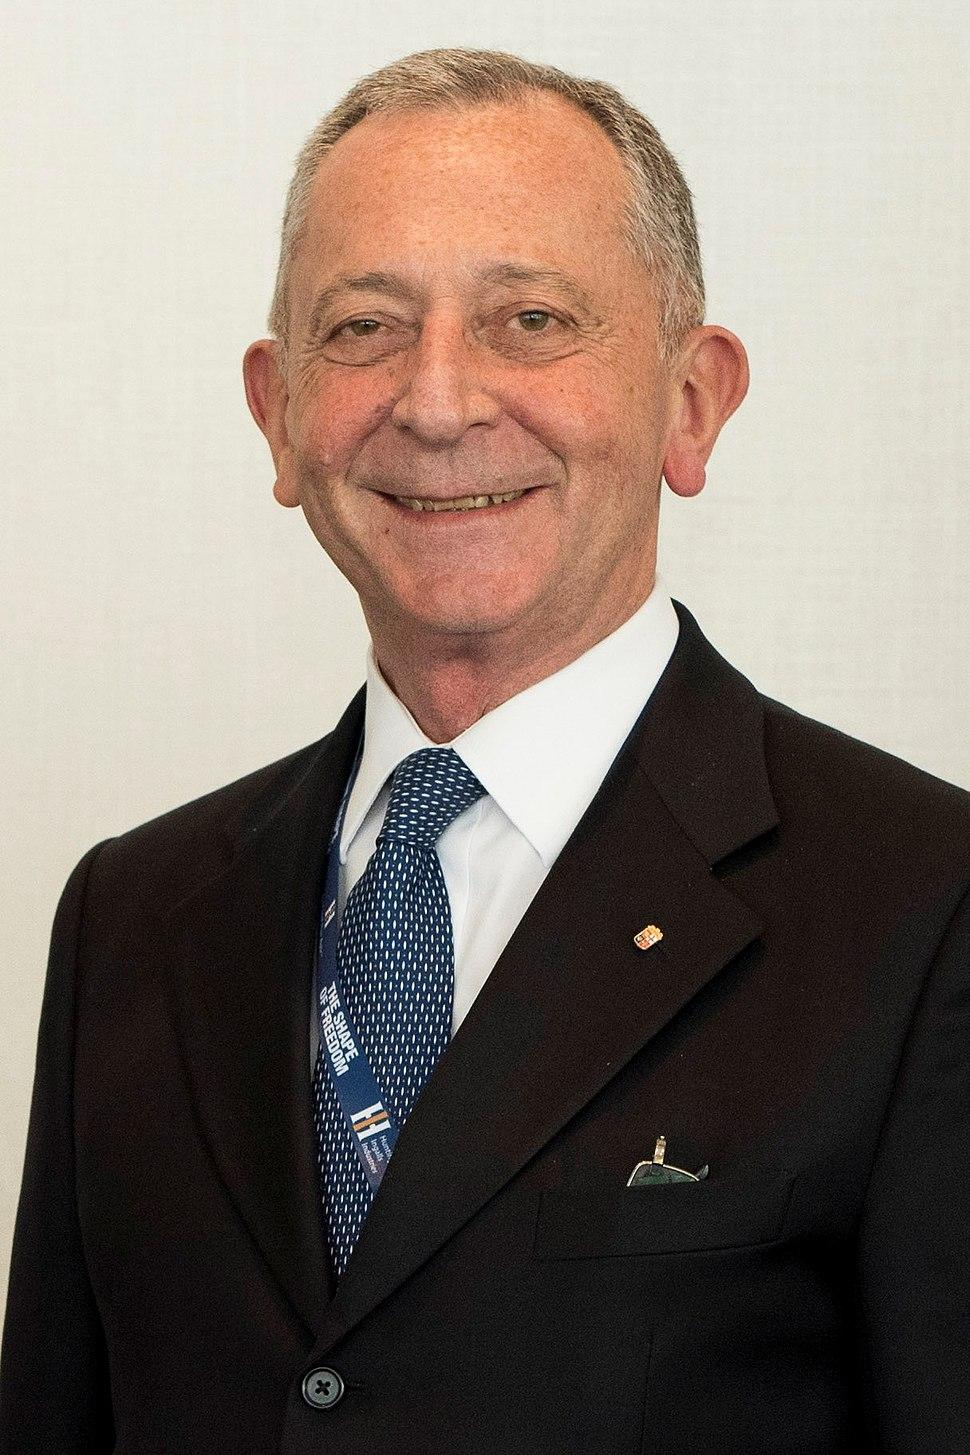 Valter Girardelli